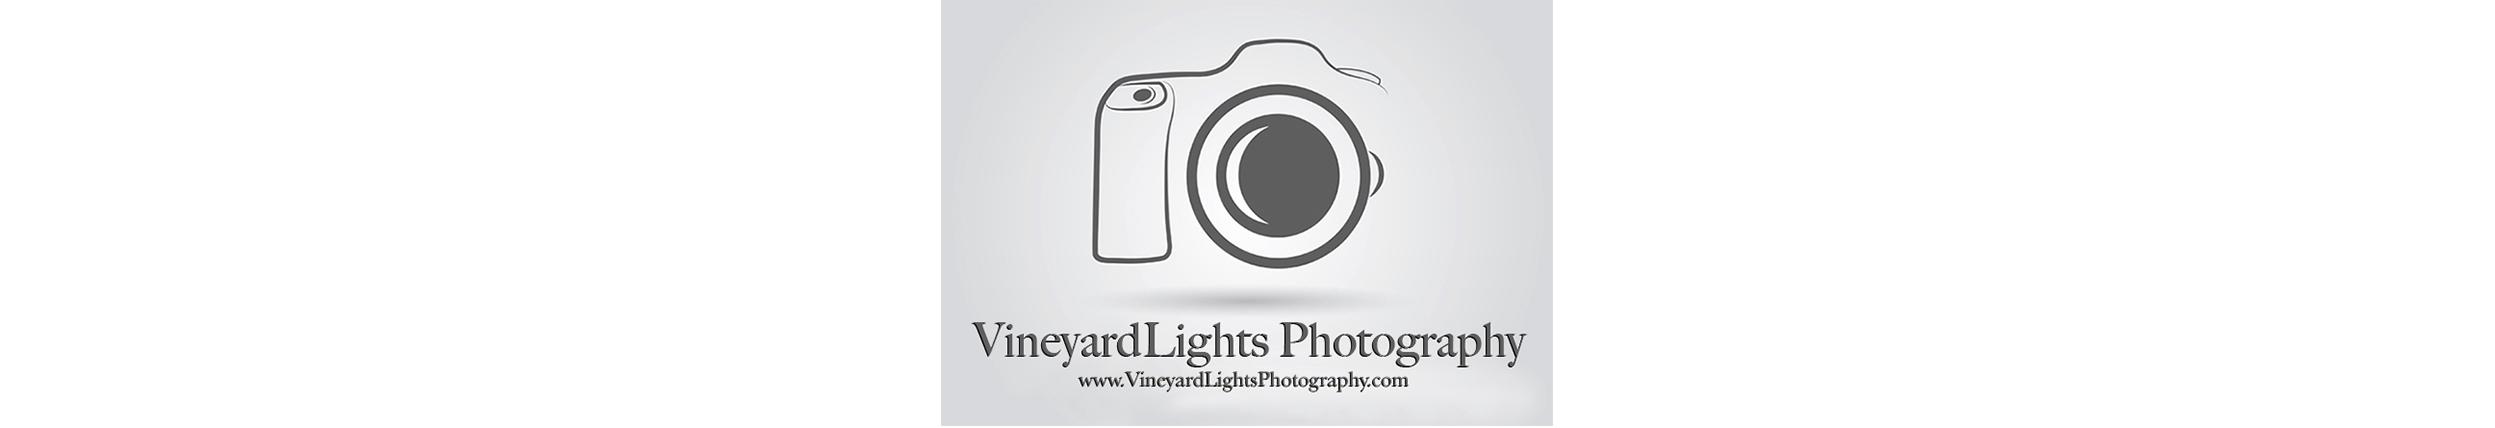 sb_vineyardlights.jpg